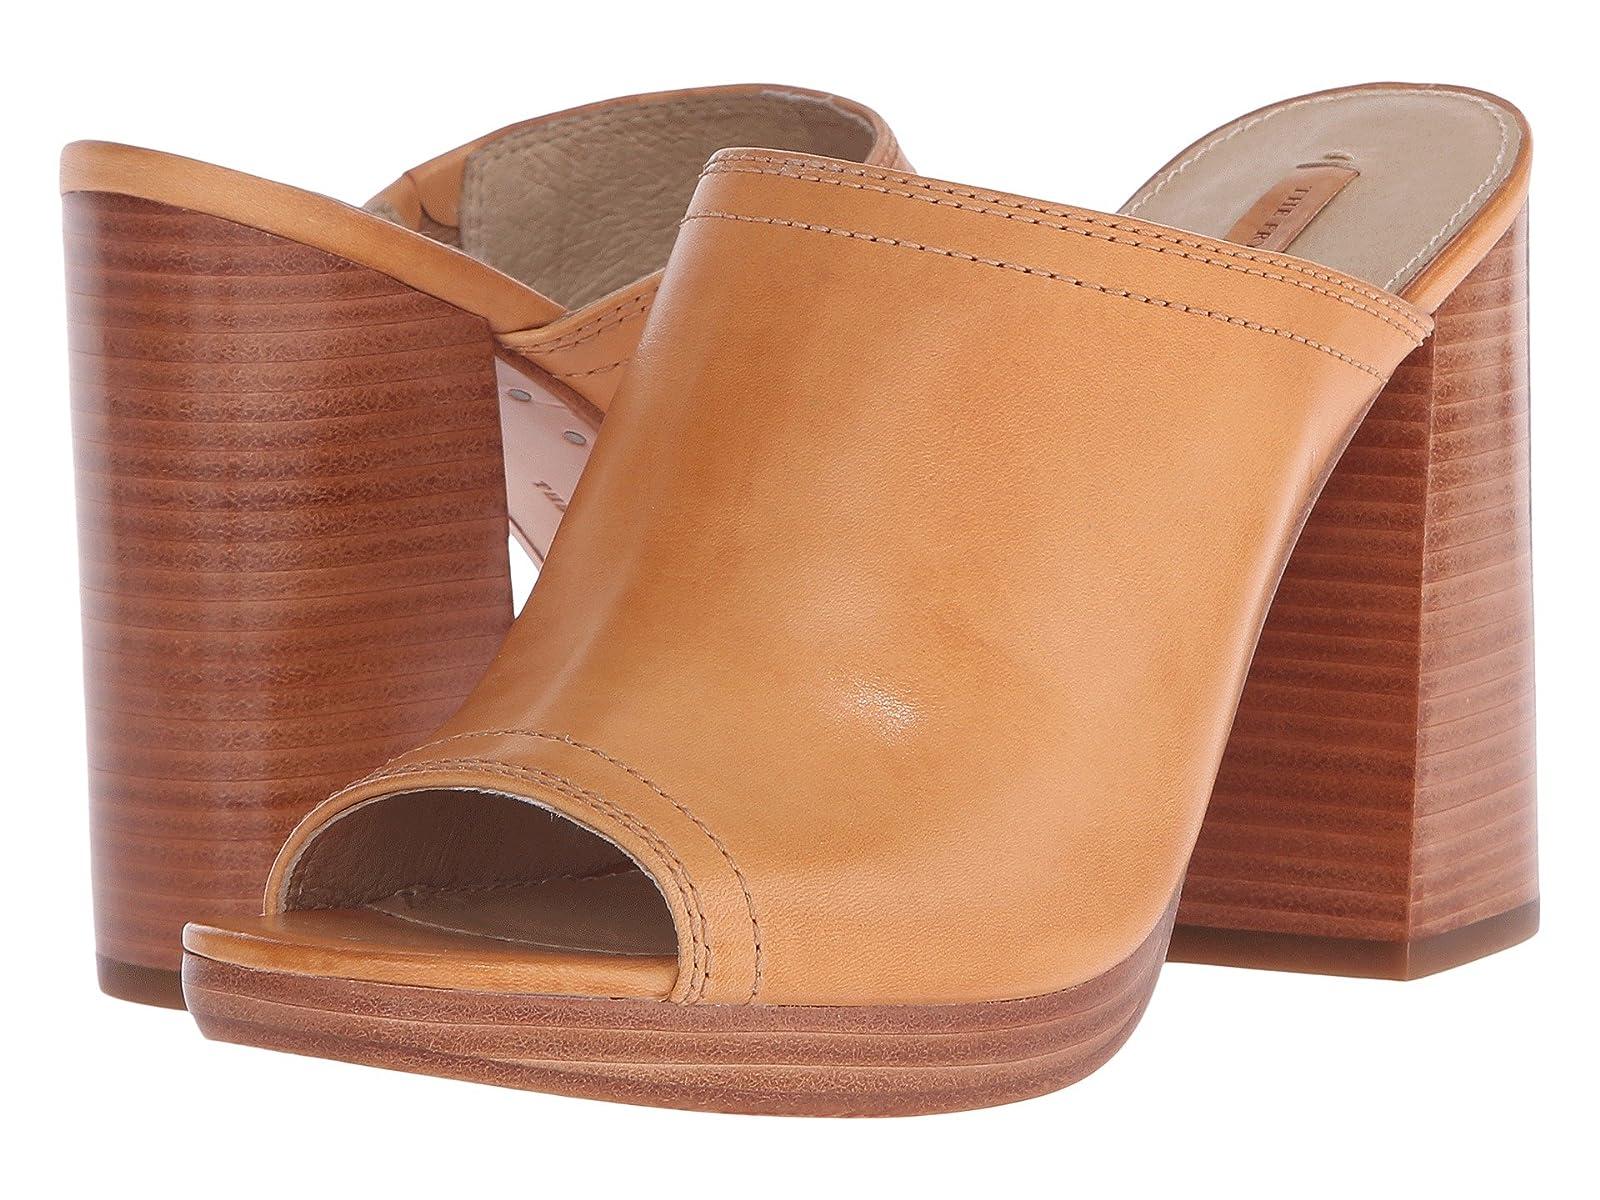 Frye Karissa MuleCheap and distinctive eye-catching shoes